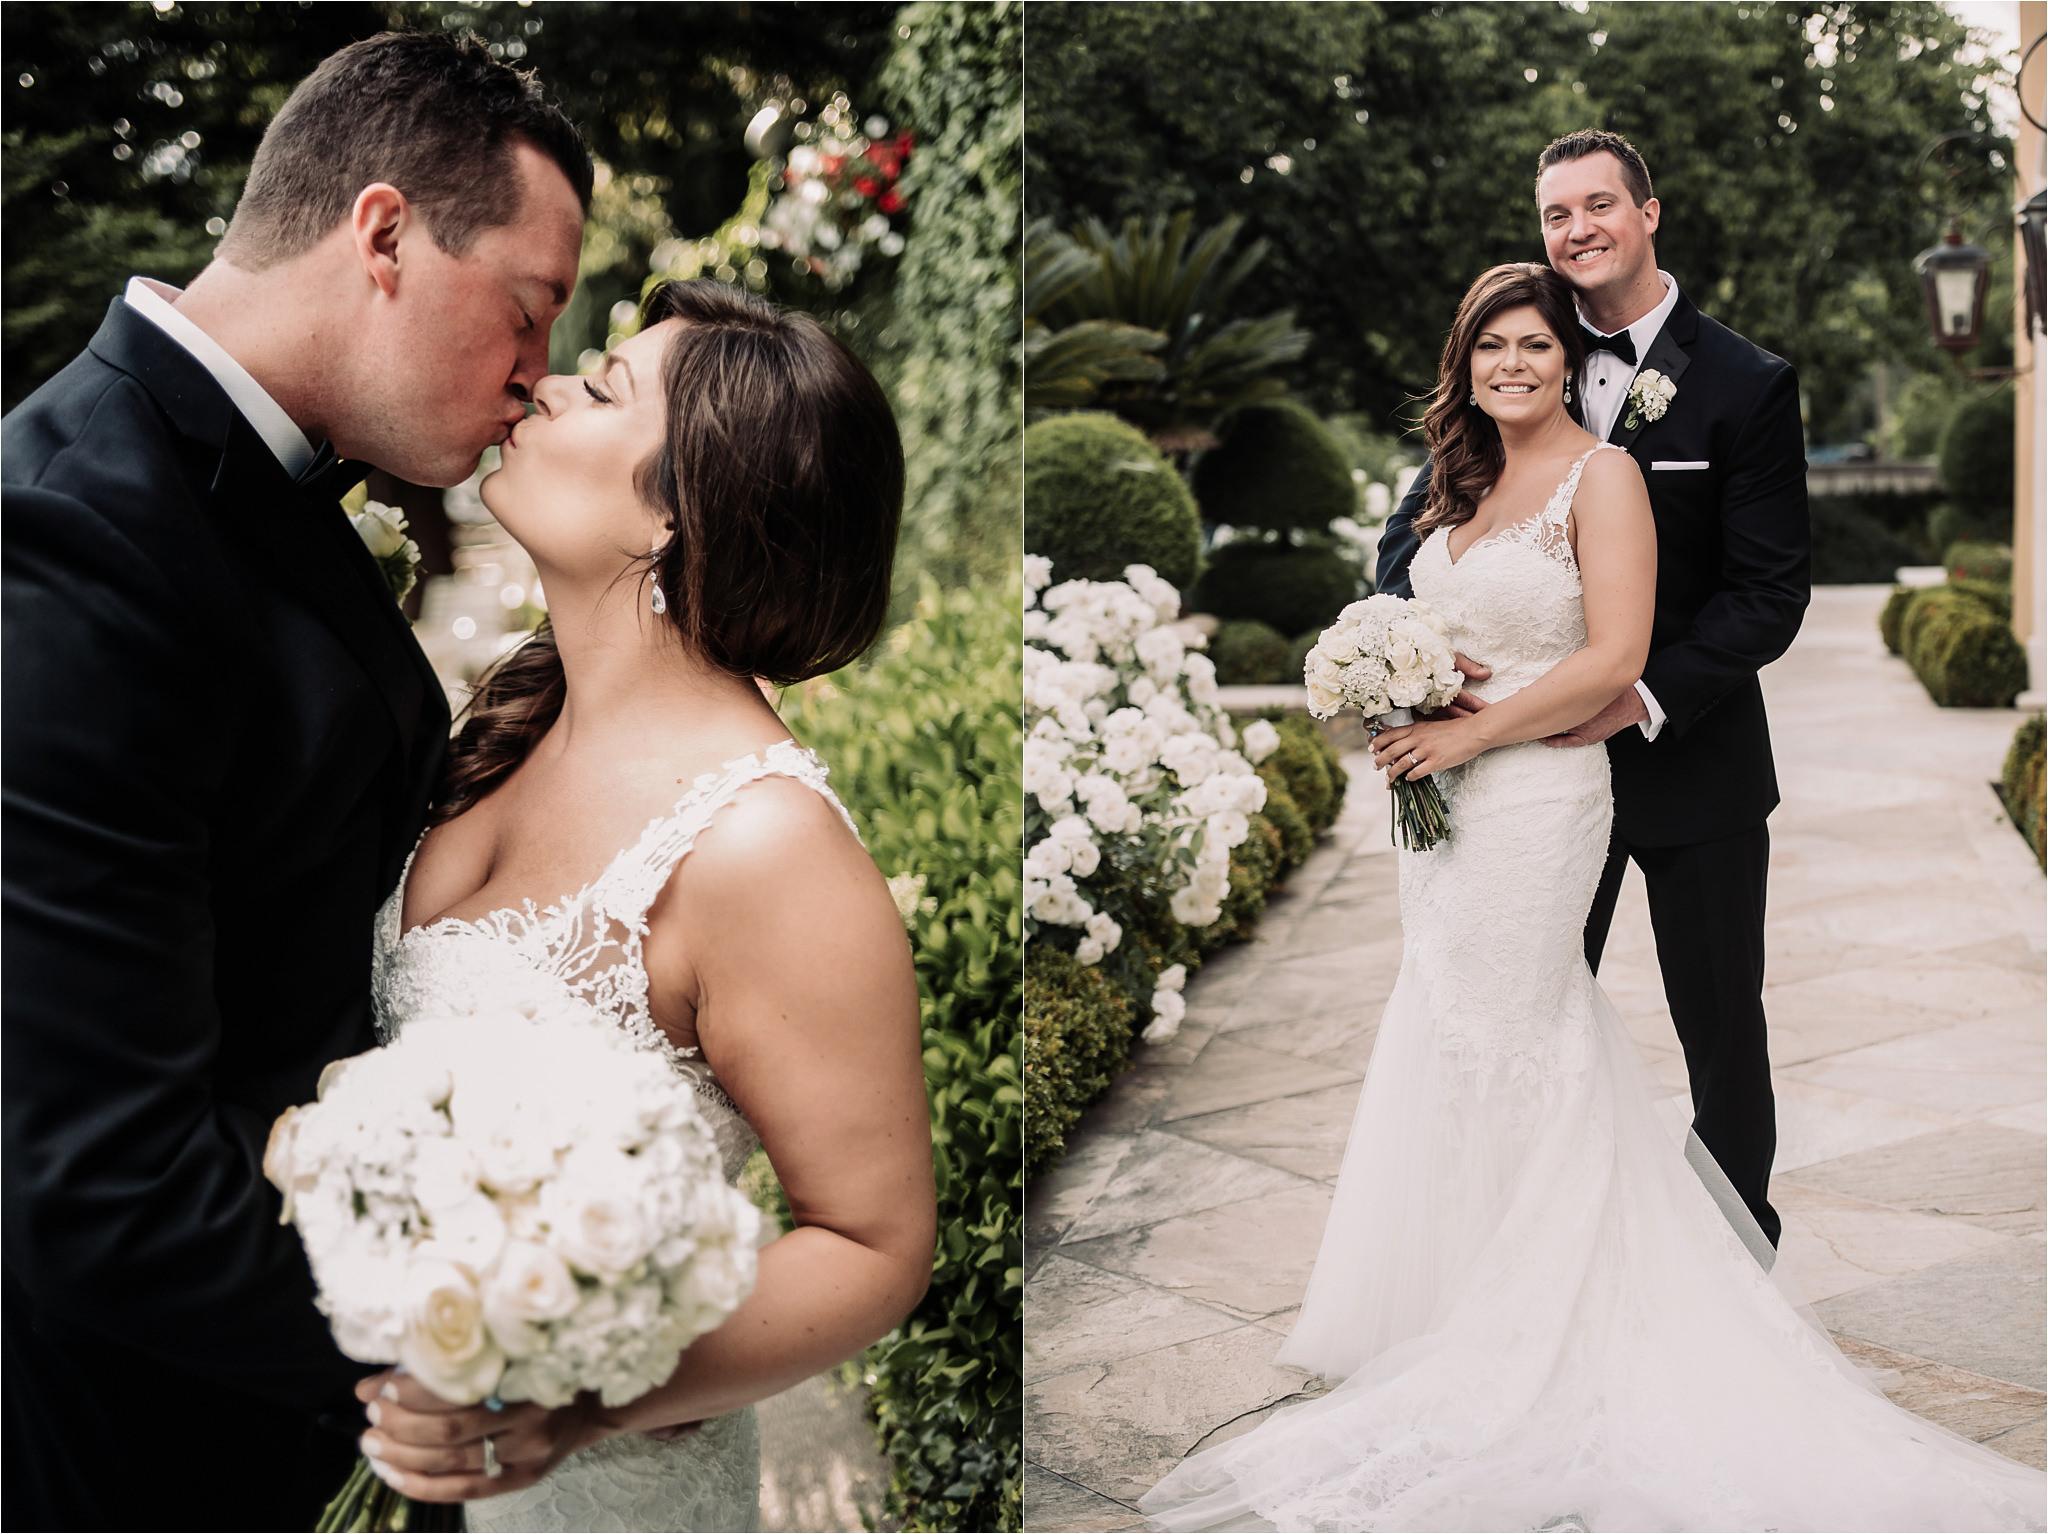 jessica-roman-photography-arden hills wedding photograpger-sacramento-boise-29.jpg